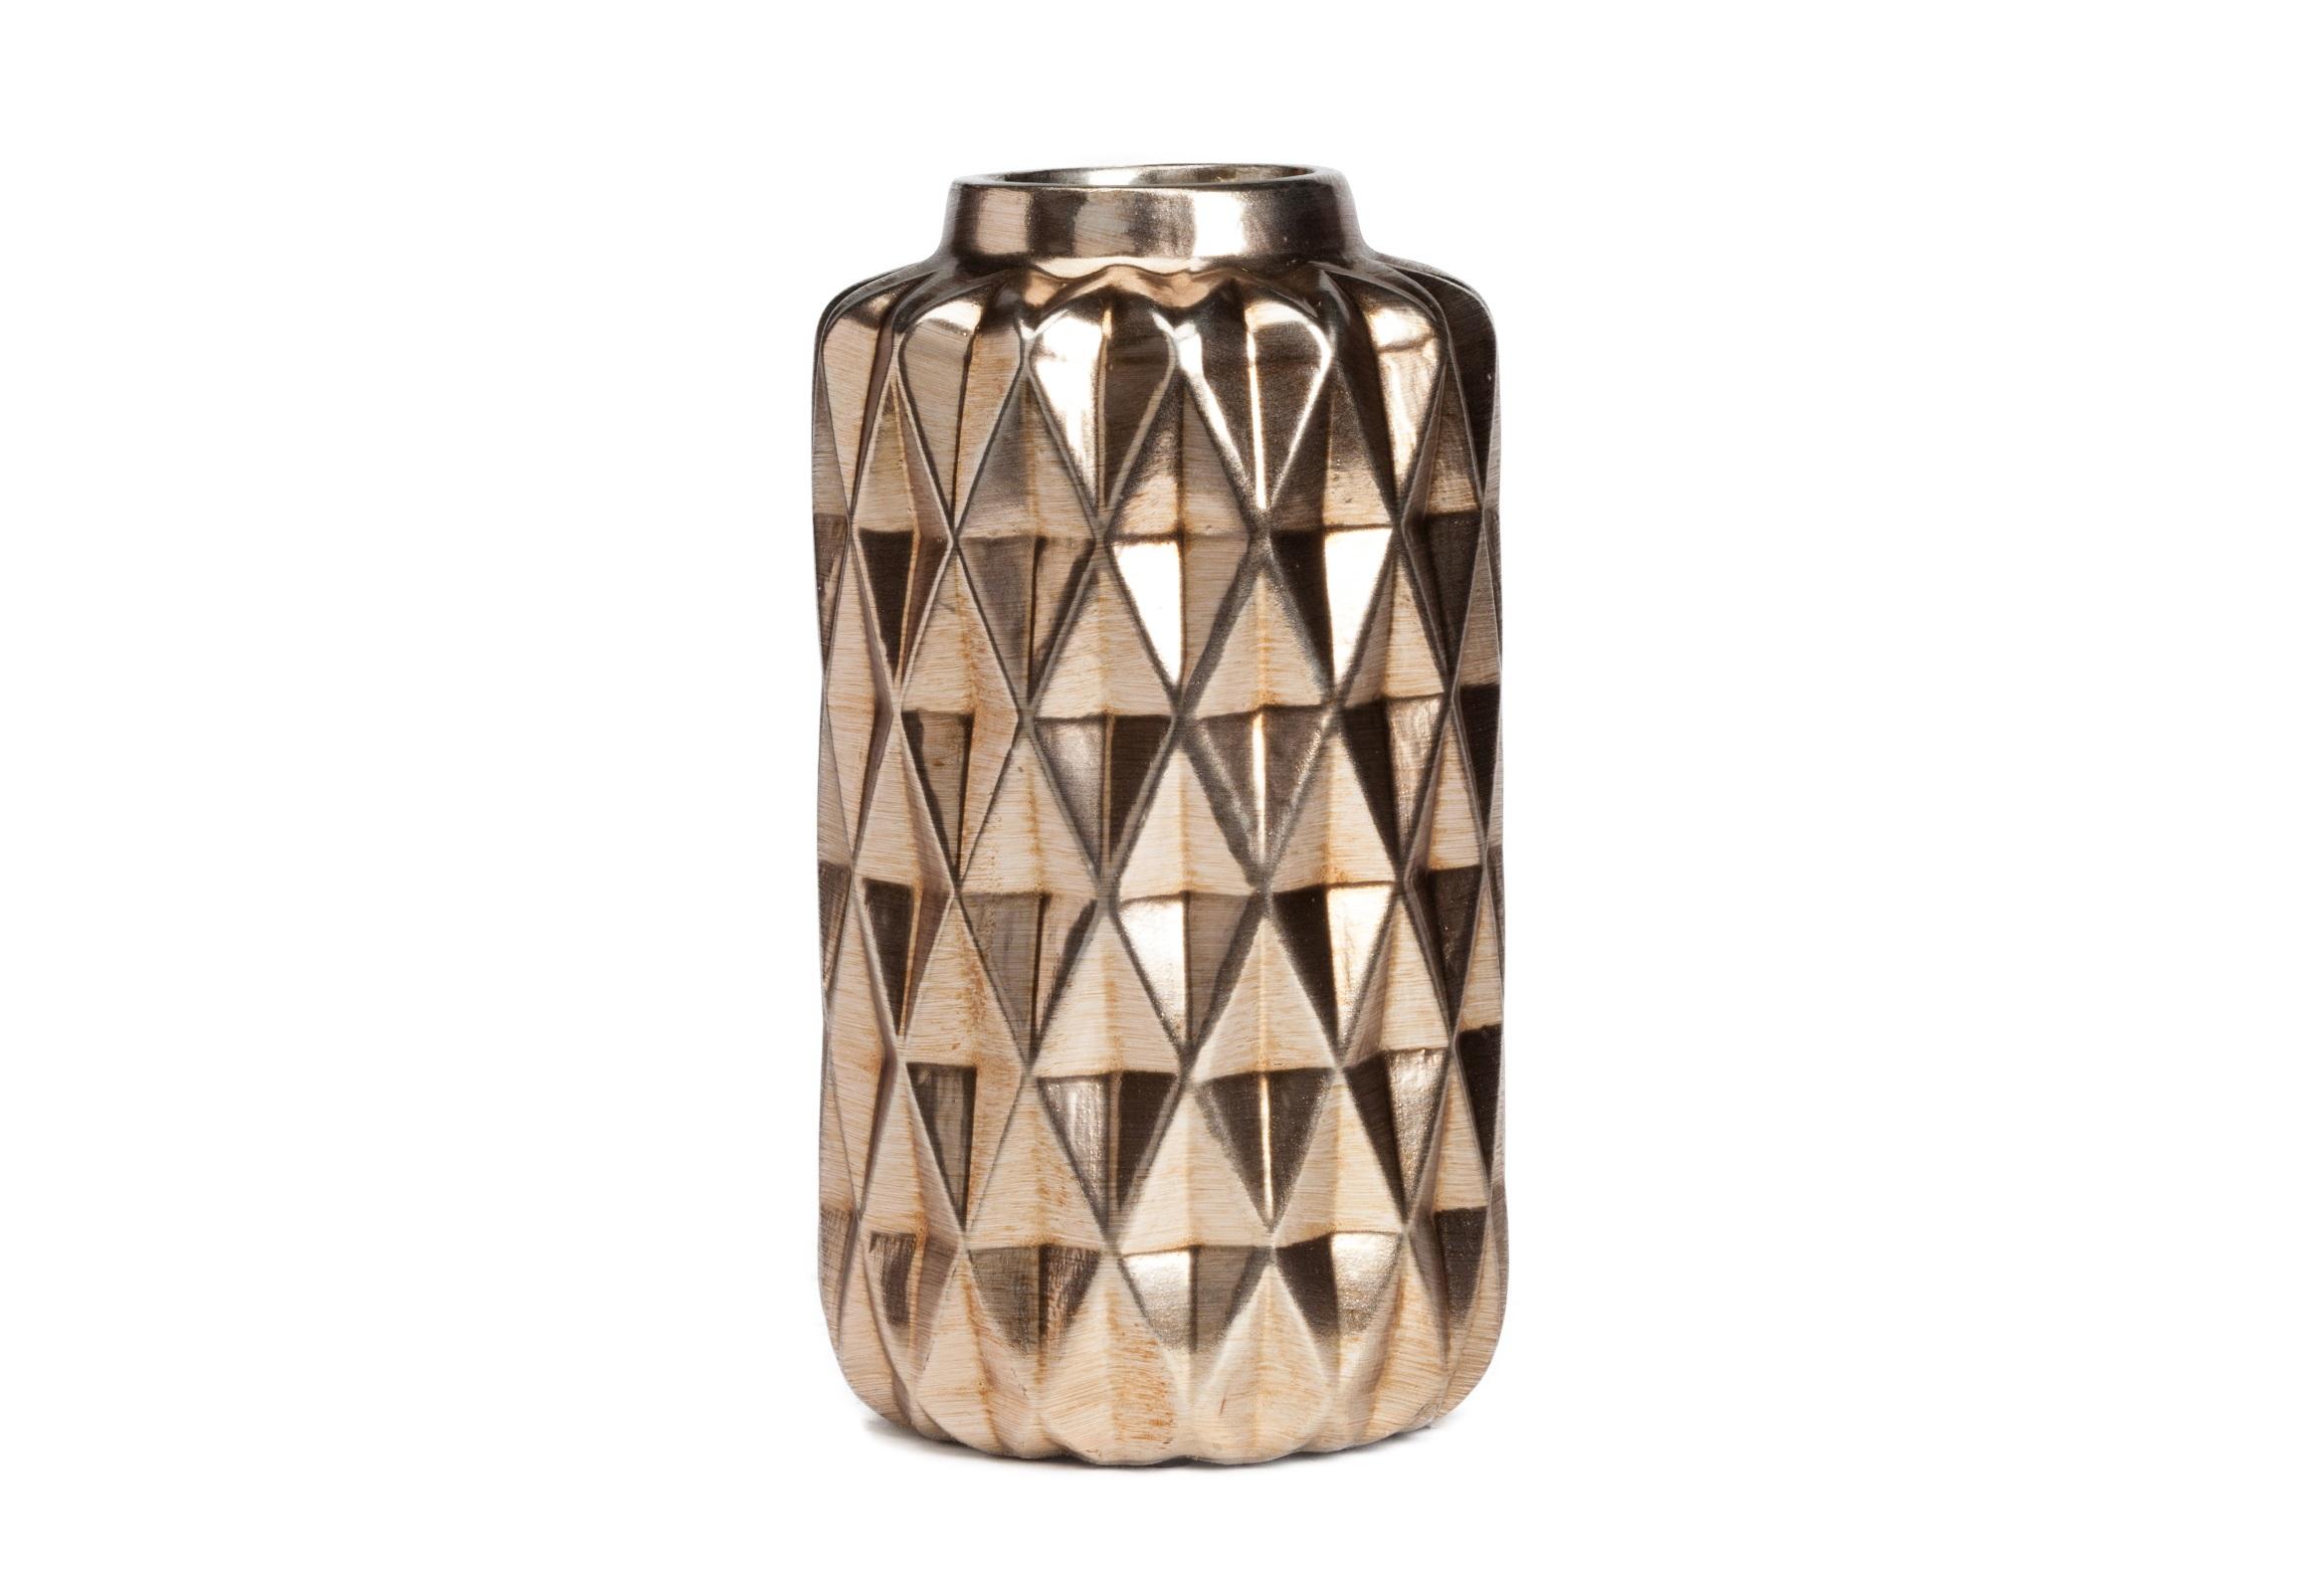 Декоративная ваза JaipurВазы<br><br><br>Material: Керамика<br>Length см: None<br>Width см: None<br>Height см: 23<br>Diameter см: 12,5